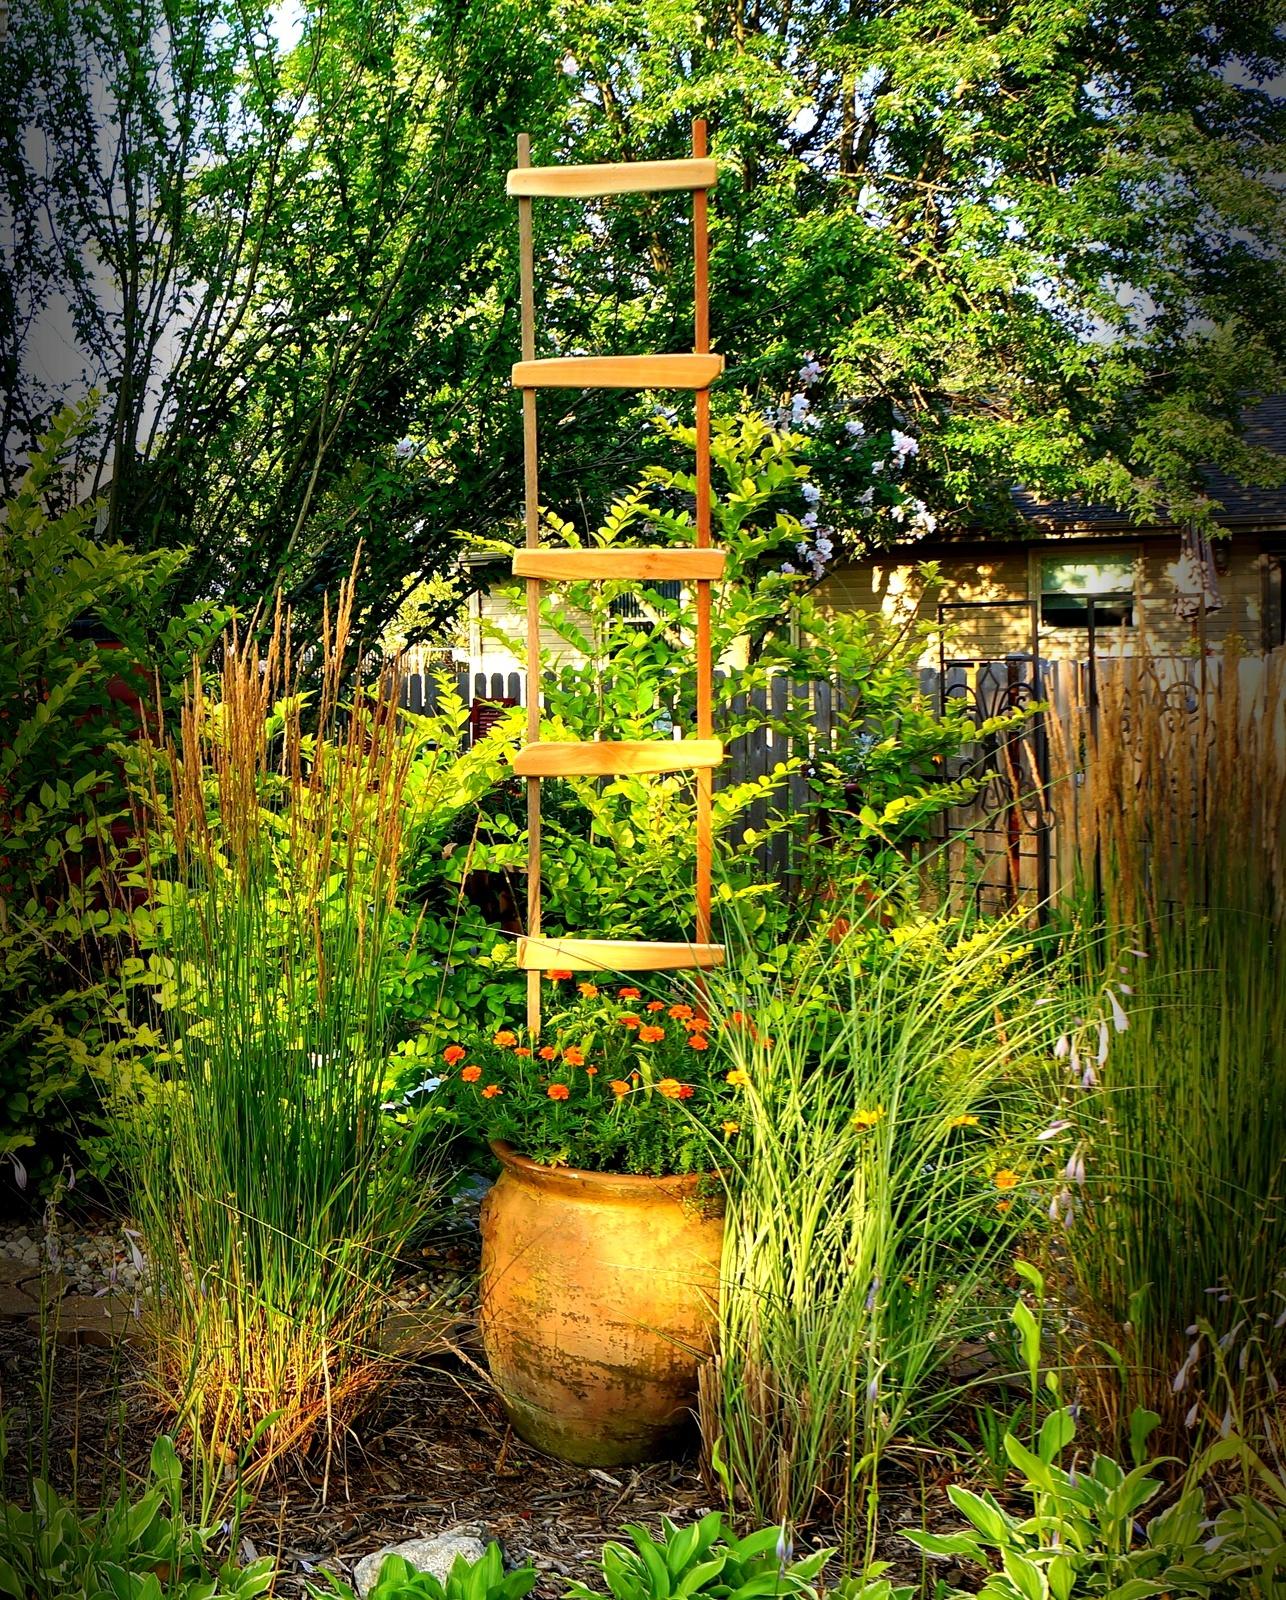 Tall Garden Trellis Decorative Ladder Pot And 49 Similar Items. Dsc03861